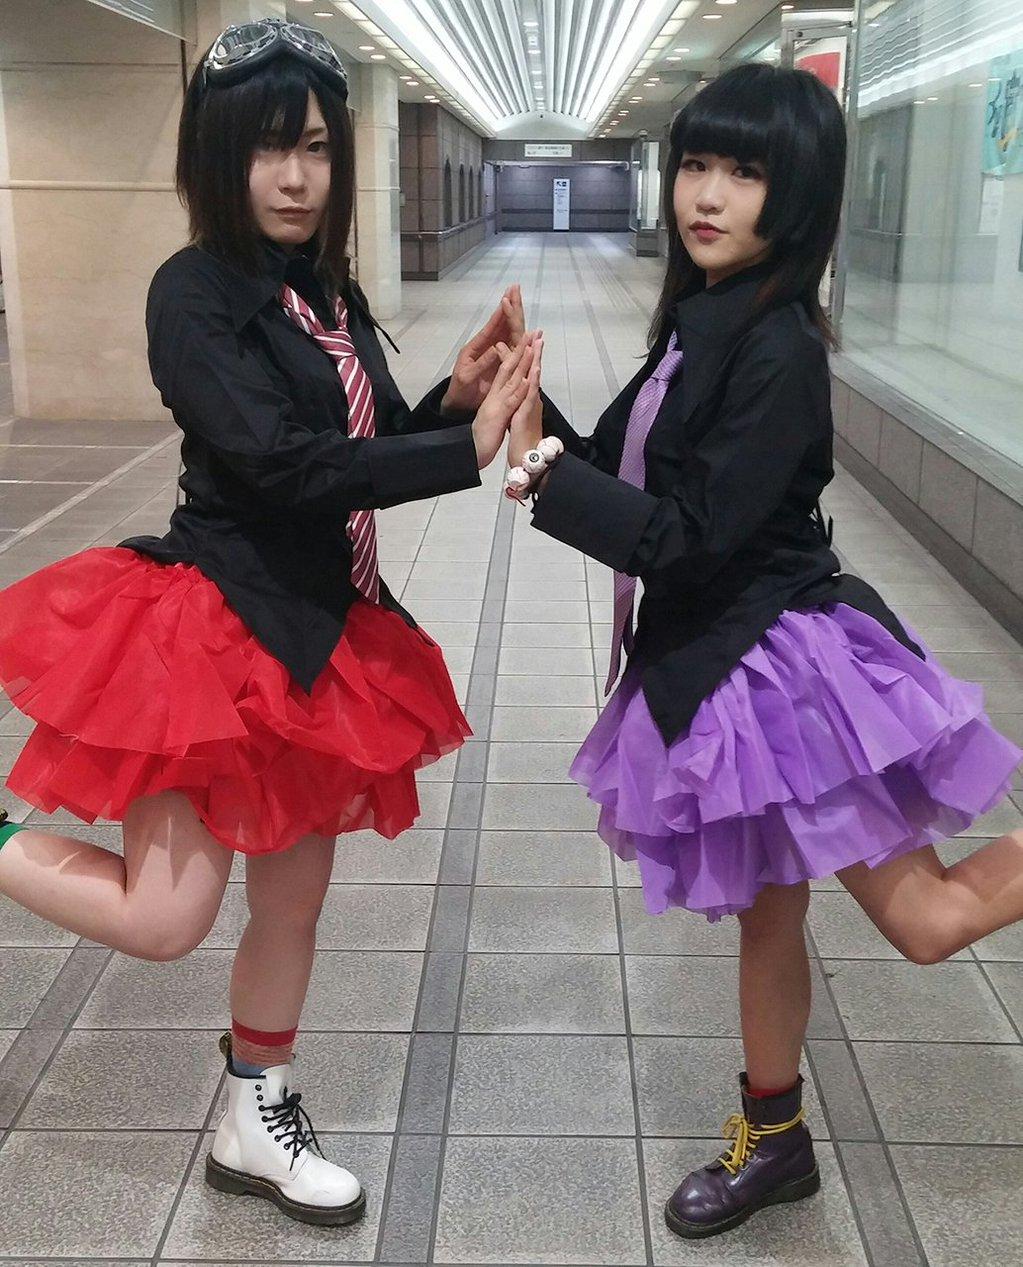 《Idol Live Circuit》IDOL PARADISE プチ SP